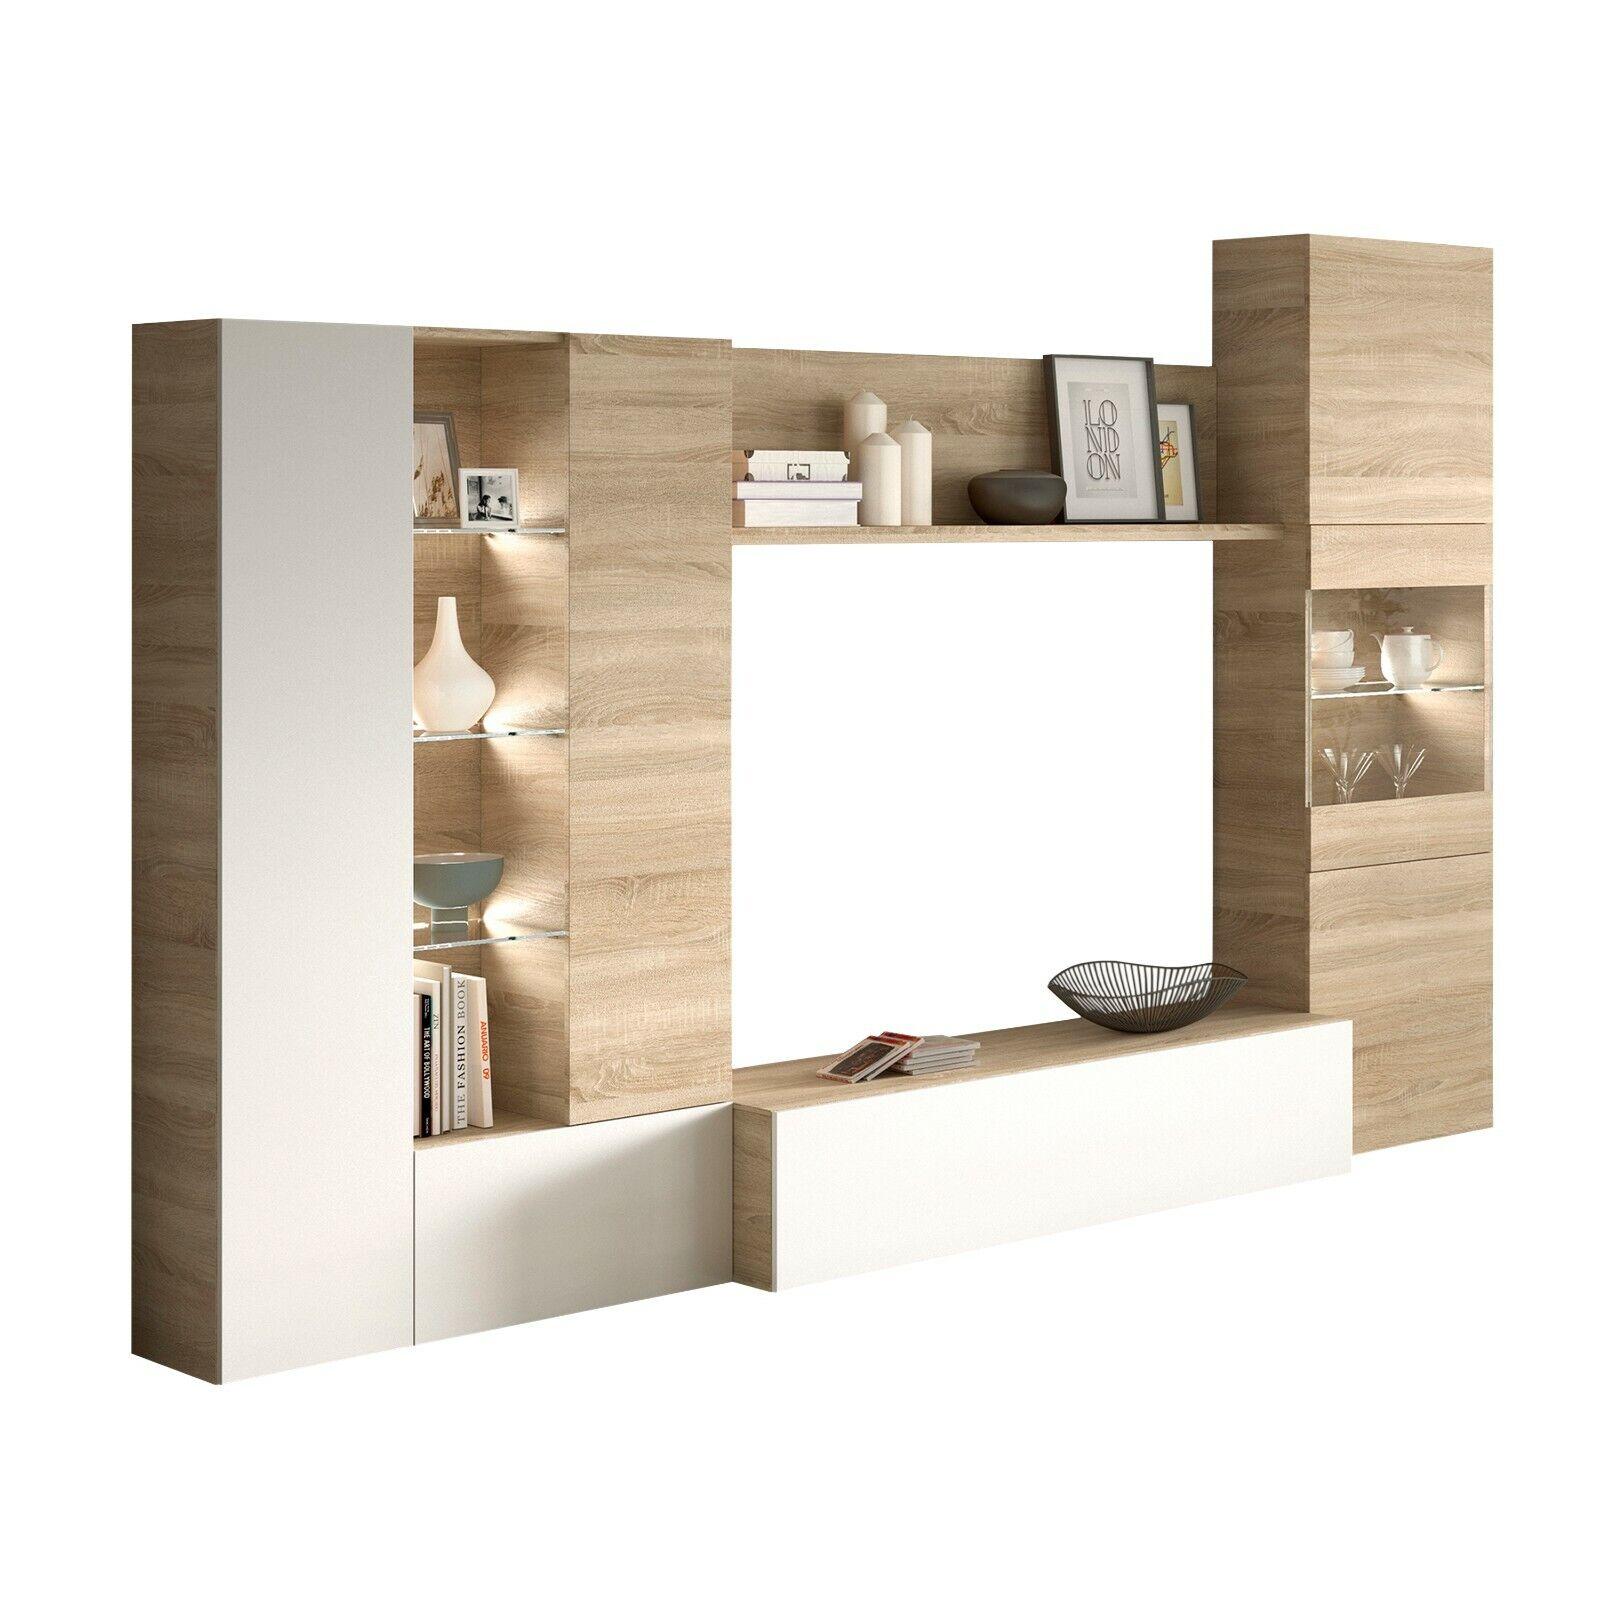 Mueble de comedor, modulo moderno para salon con LEDs, Blanco y Roble...